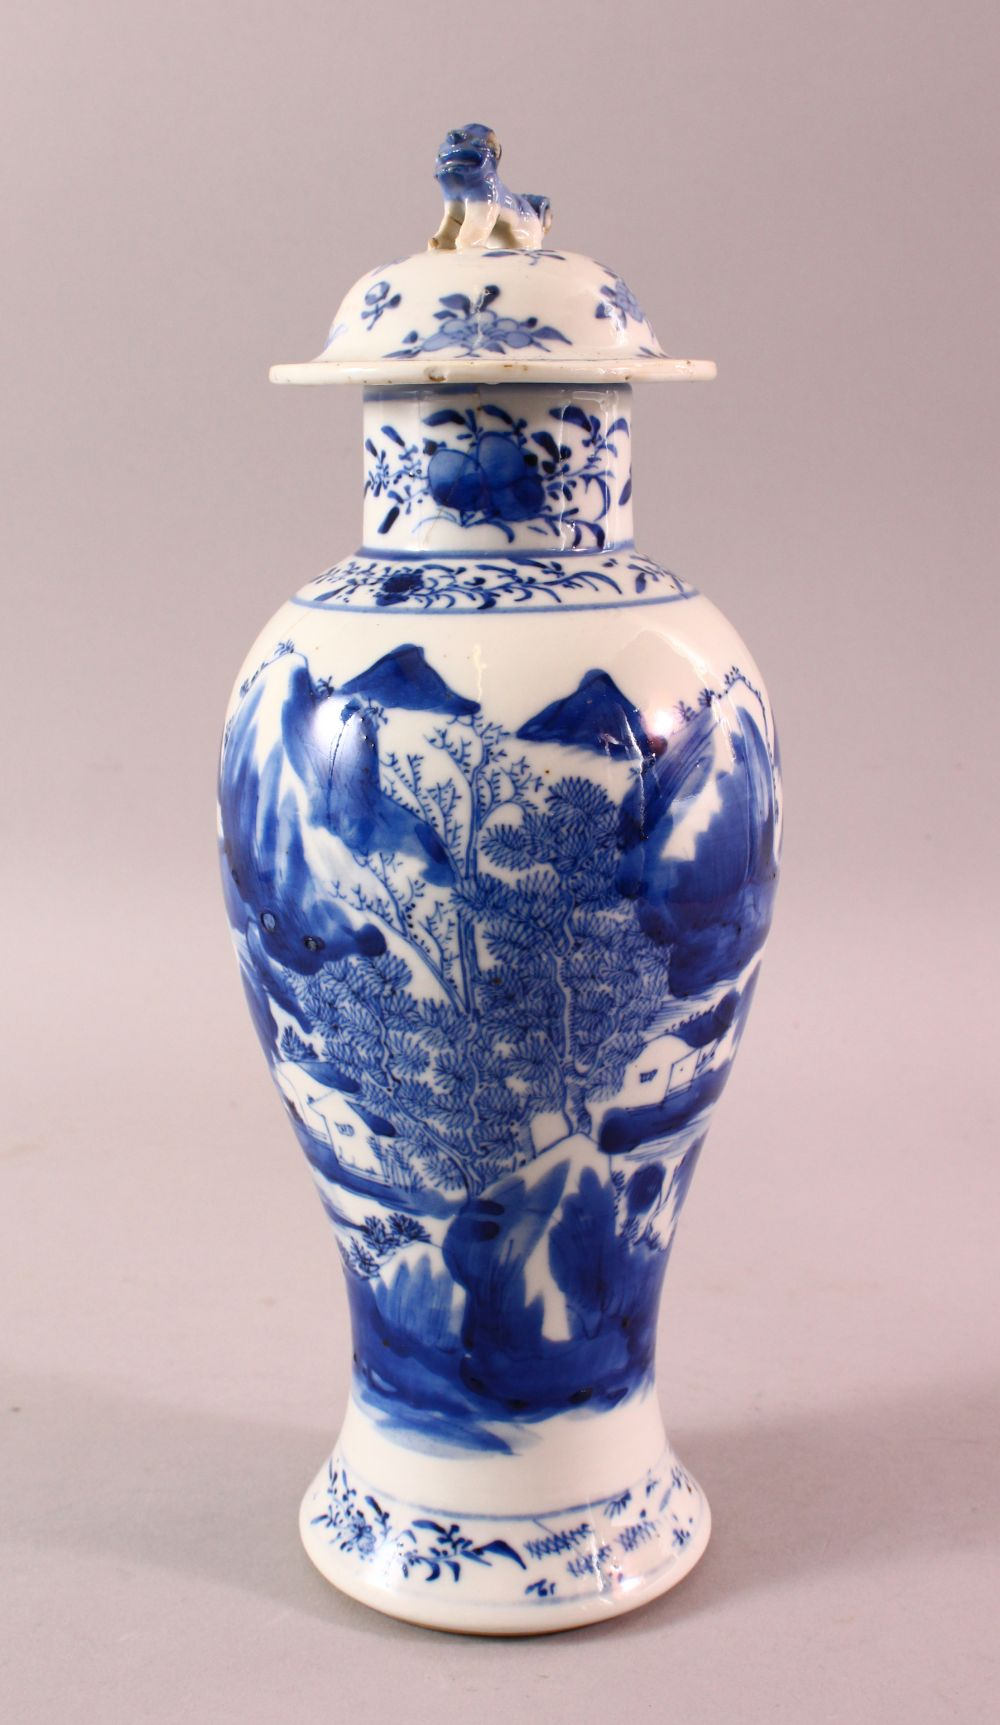 A CHINESE BLUE & WHITE PORCELAIN LANDSCAPE VASE, with decoration of landscapes, with a lion dog